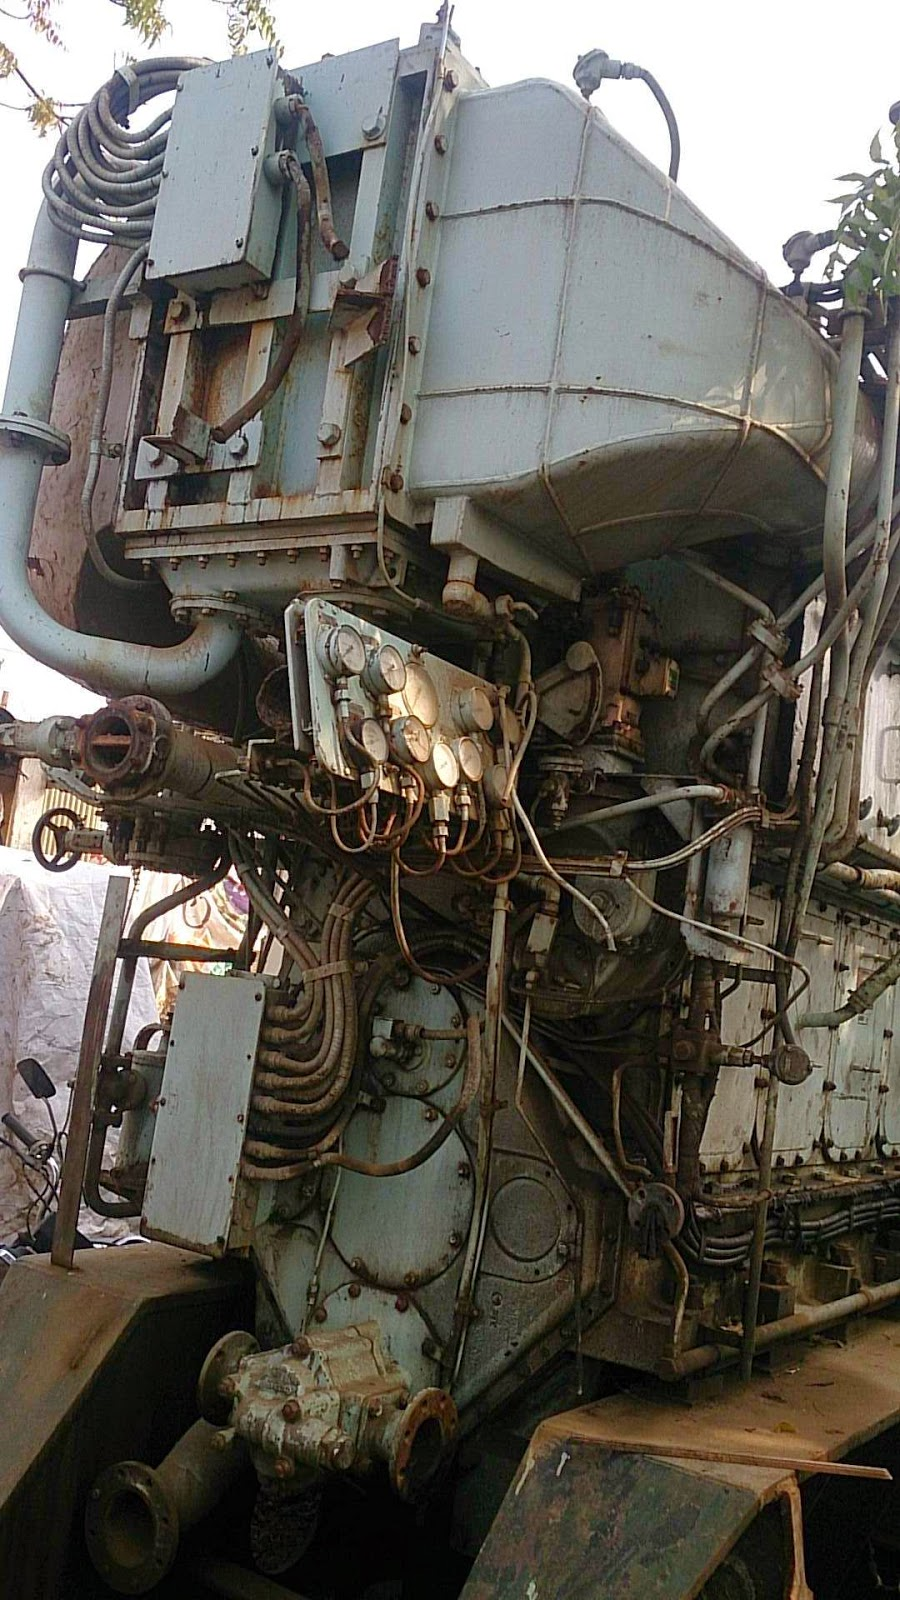 Daihatsu used second hand generators, Daihatsu generator supplier